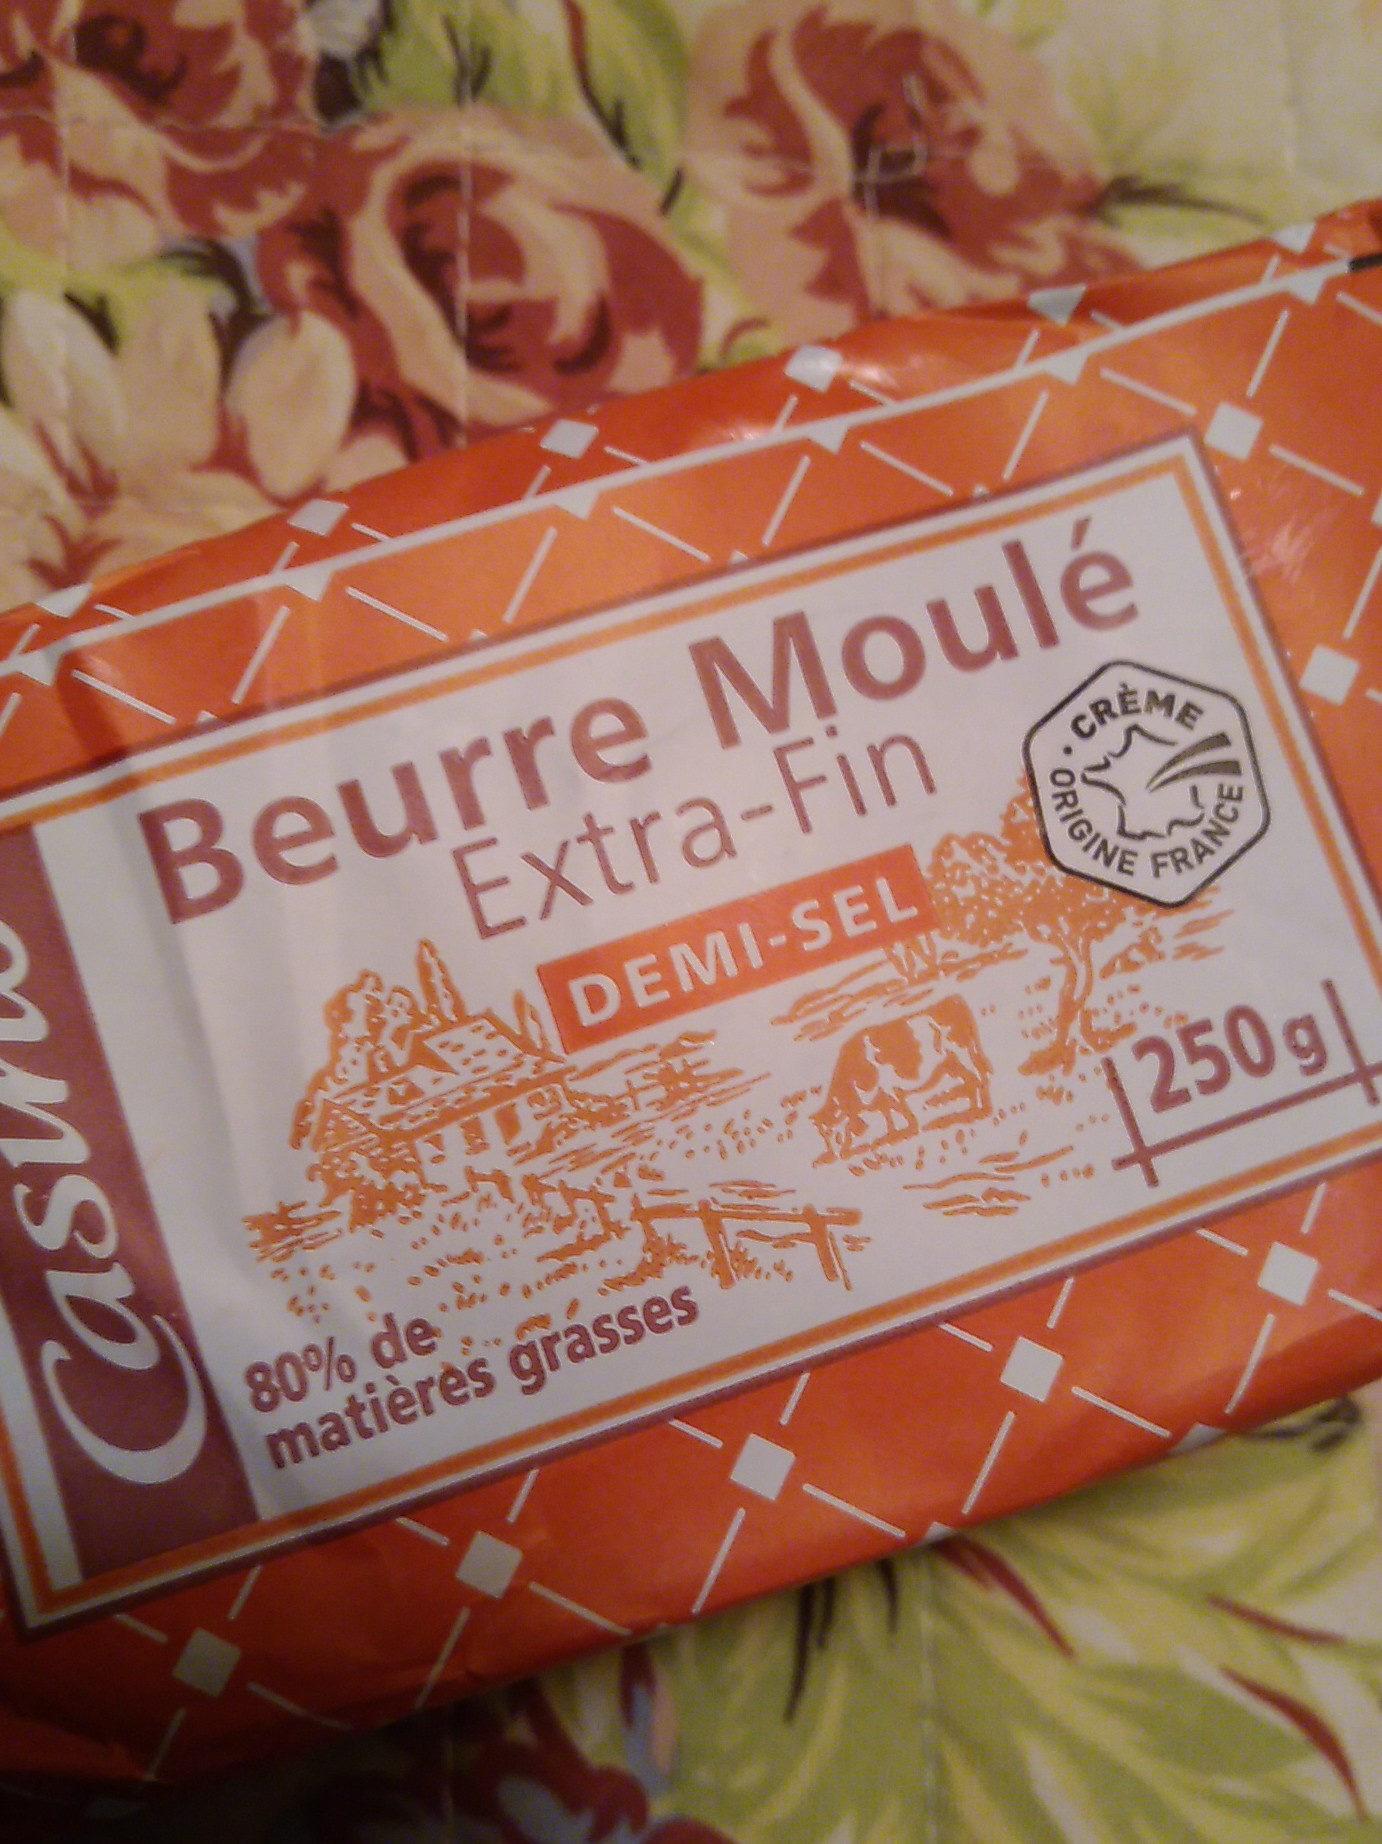 beurre salé  moulé Extra fin - Product - fr